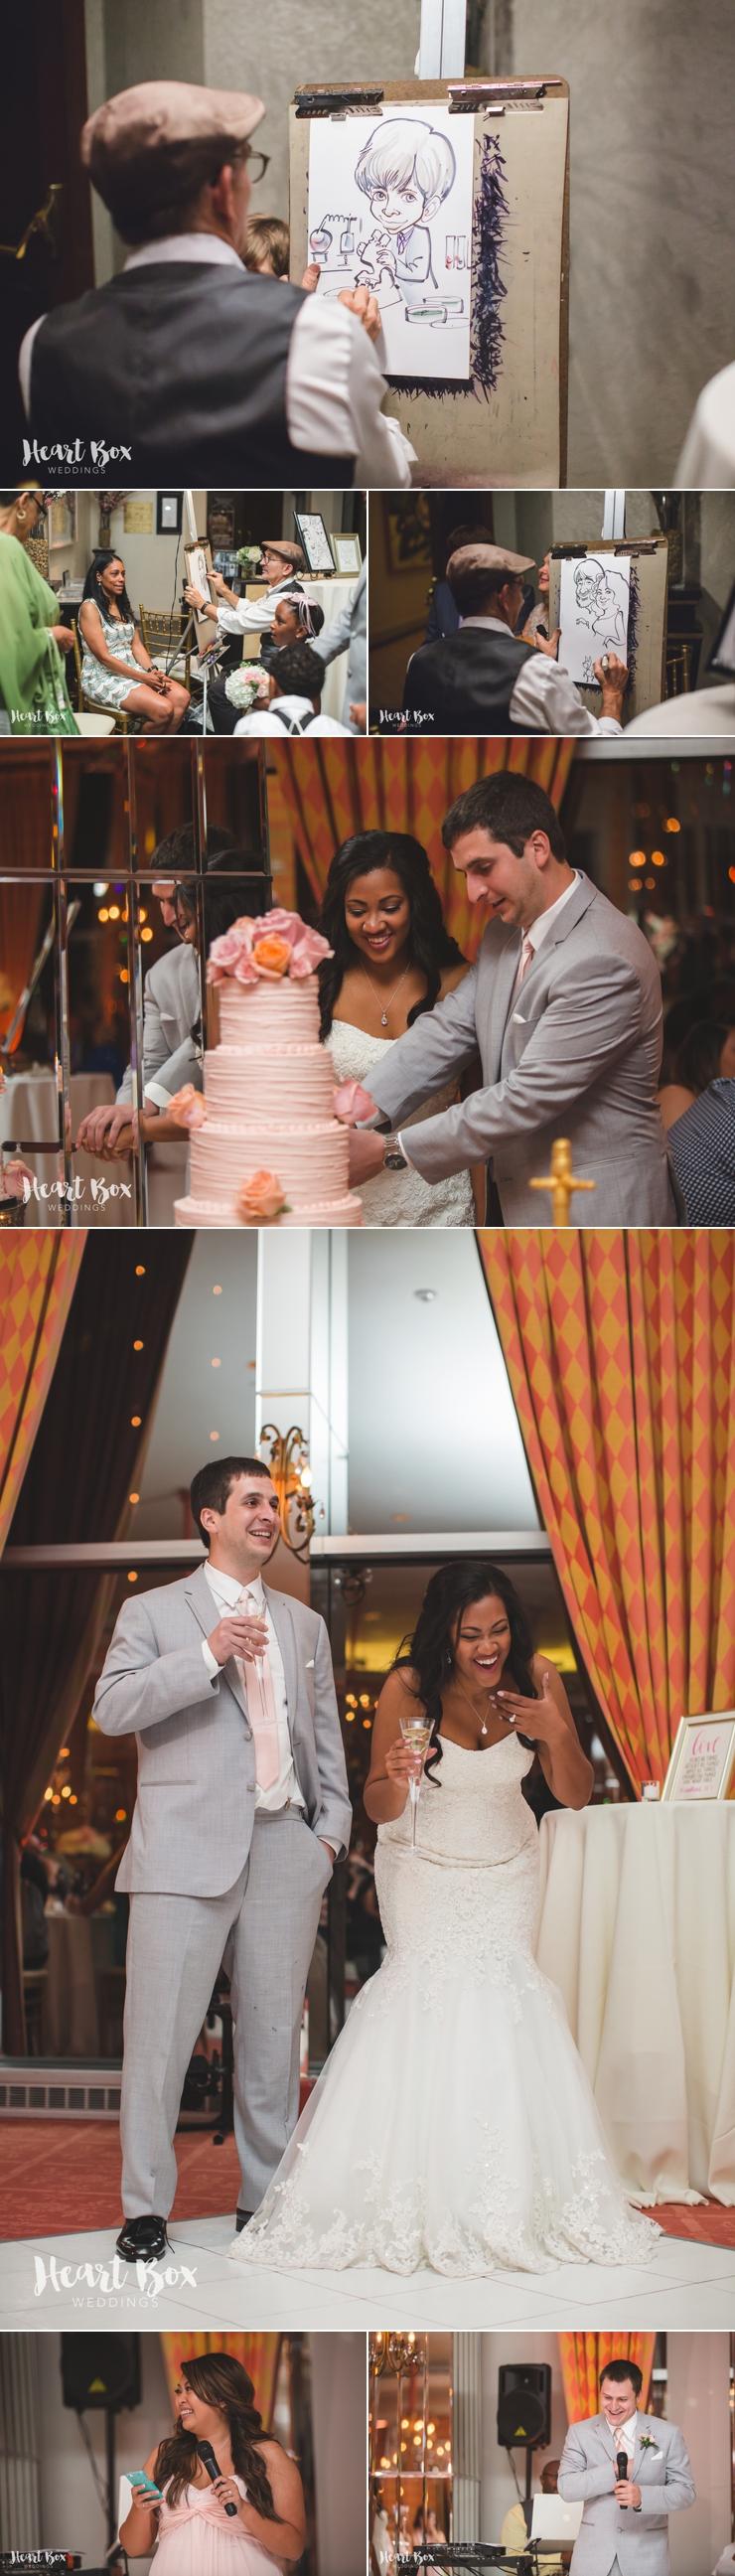 Smith Wedding Blog Collages 13.jpg